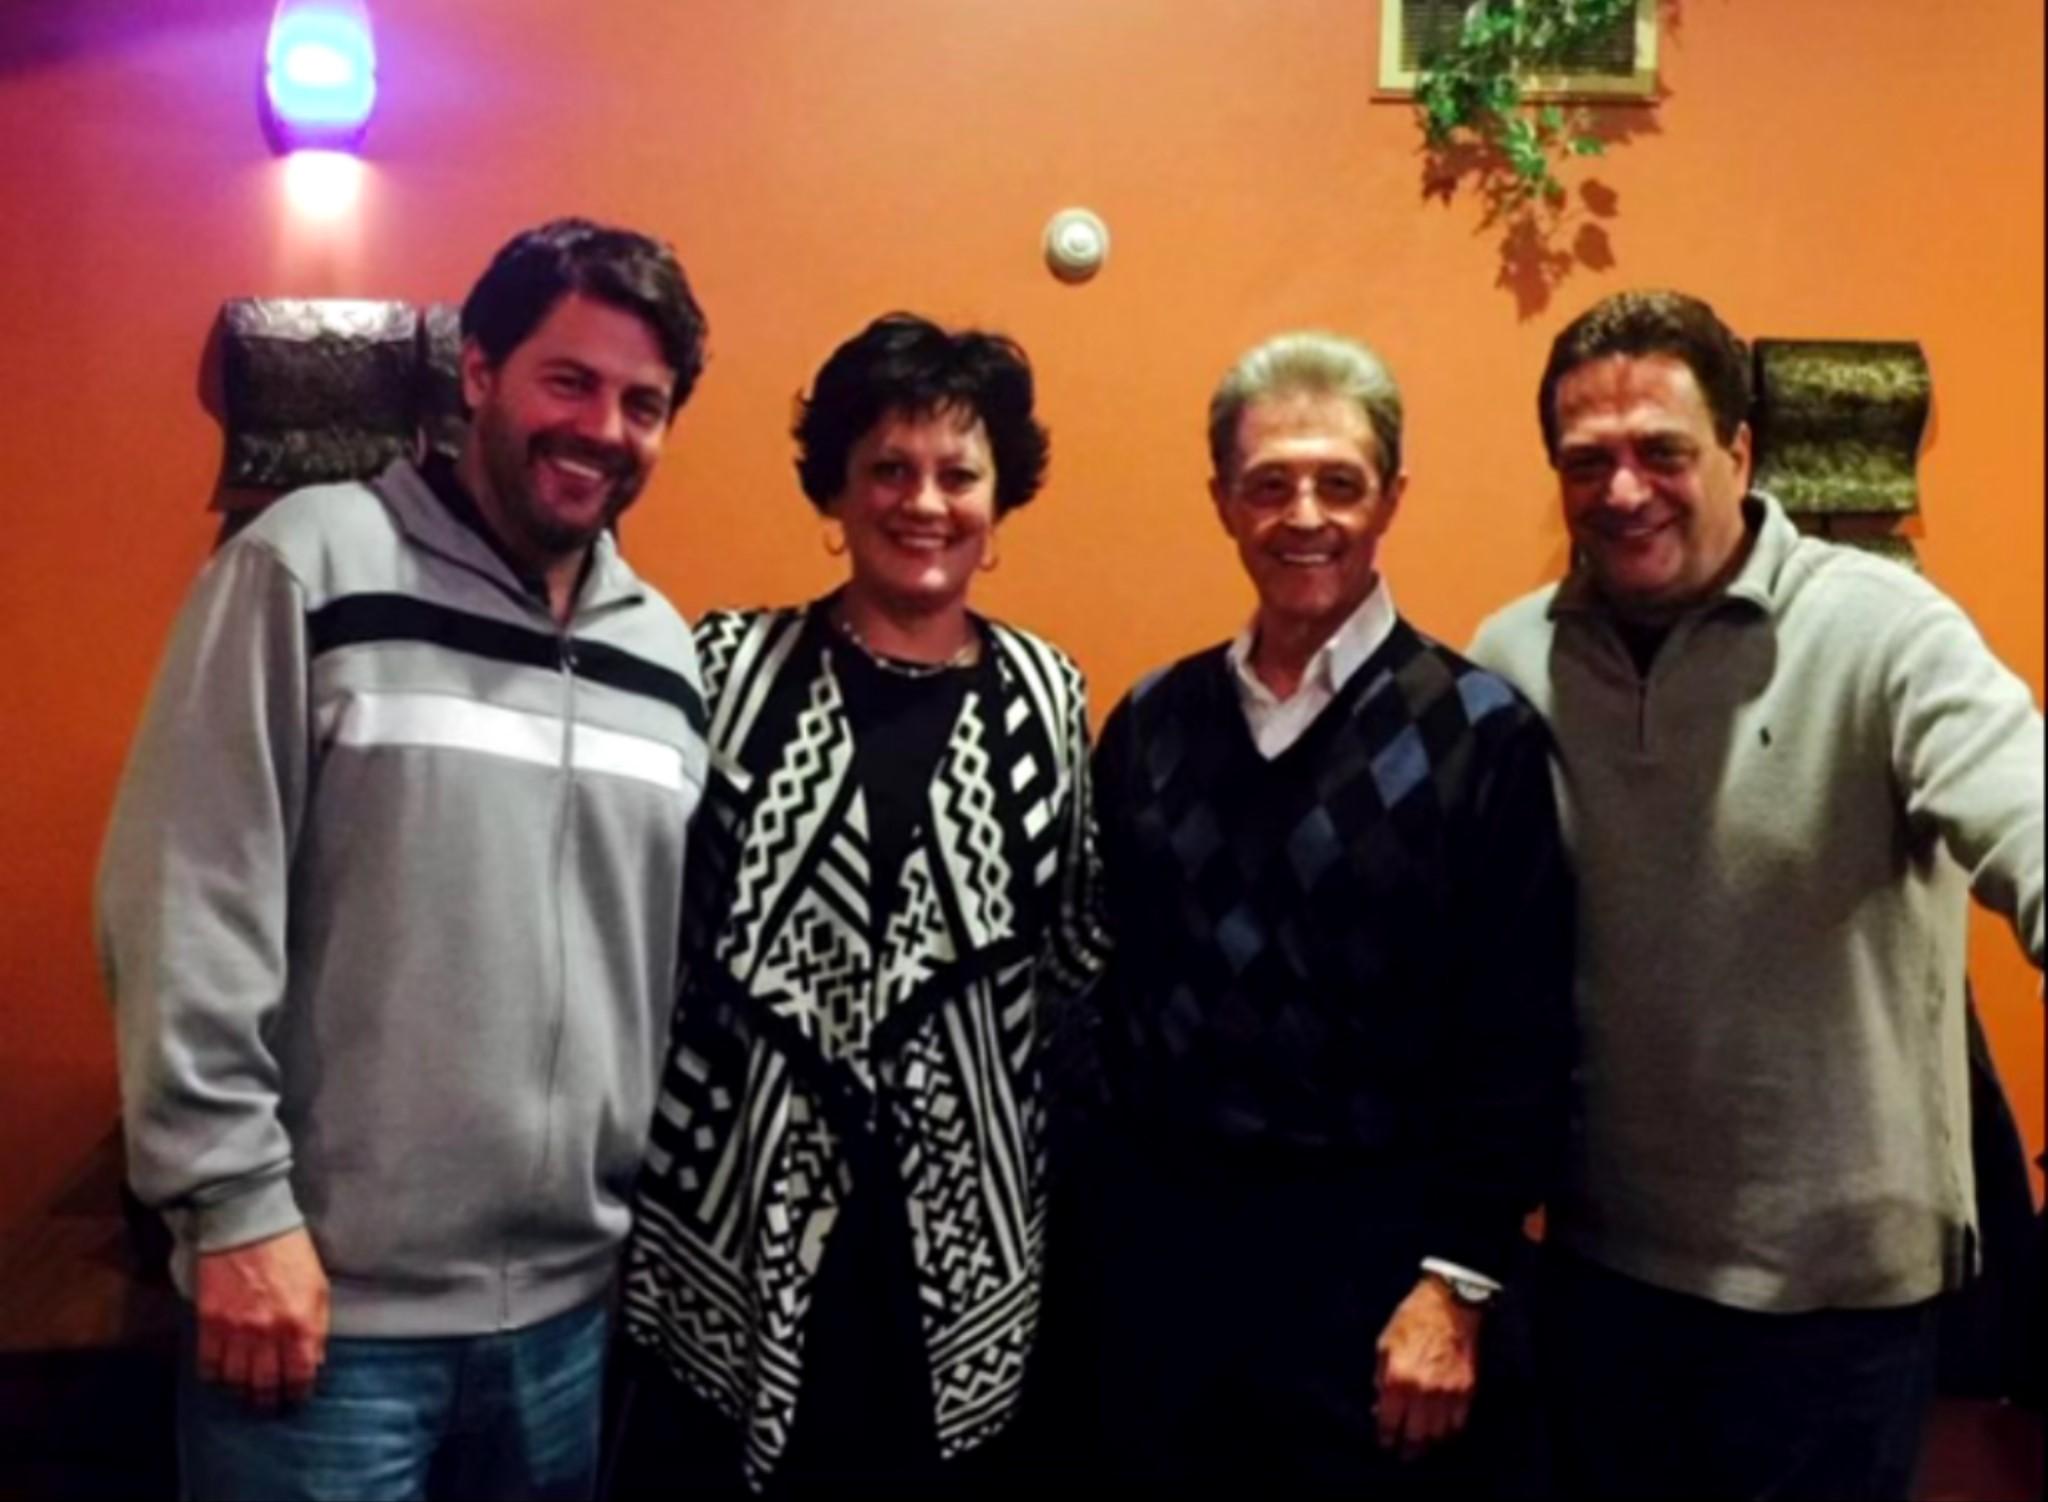 Greg Lorenze, Cindy Myers, Steve Lorenze Jr., Jerry Lorenze